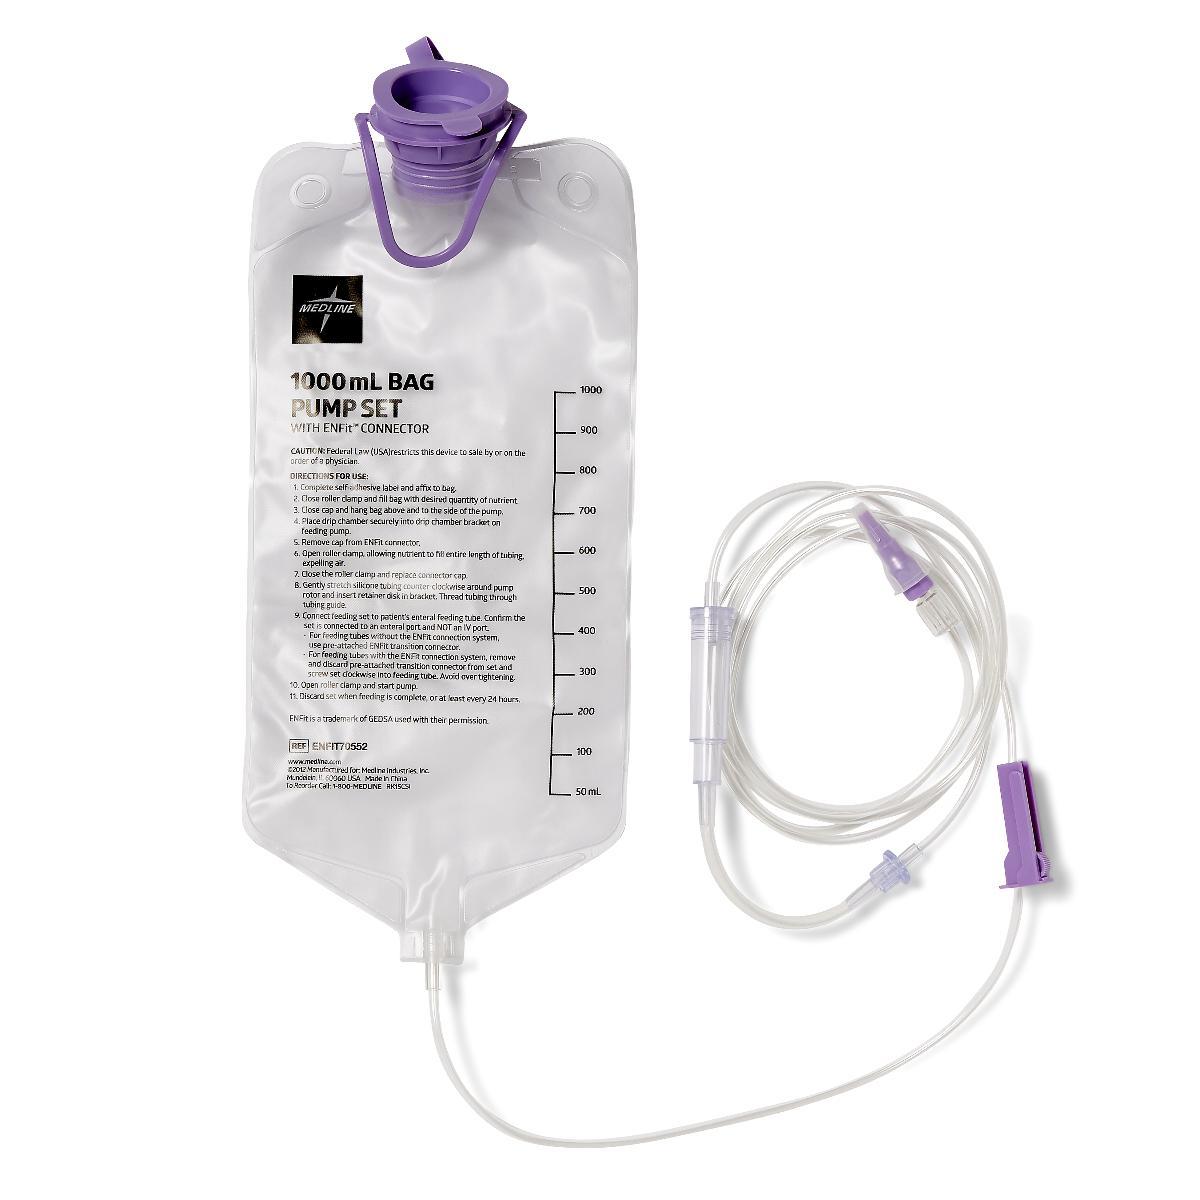 Entraflo Formerly Compat Enteral Feed 1l Bag Pump Set W